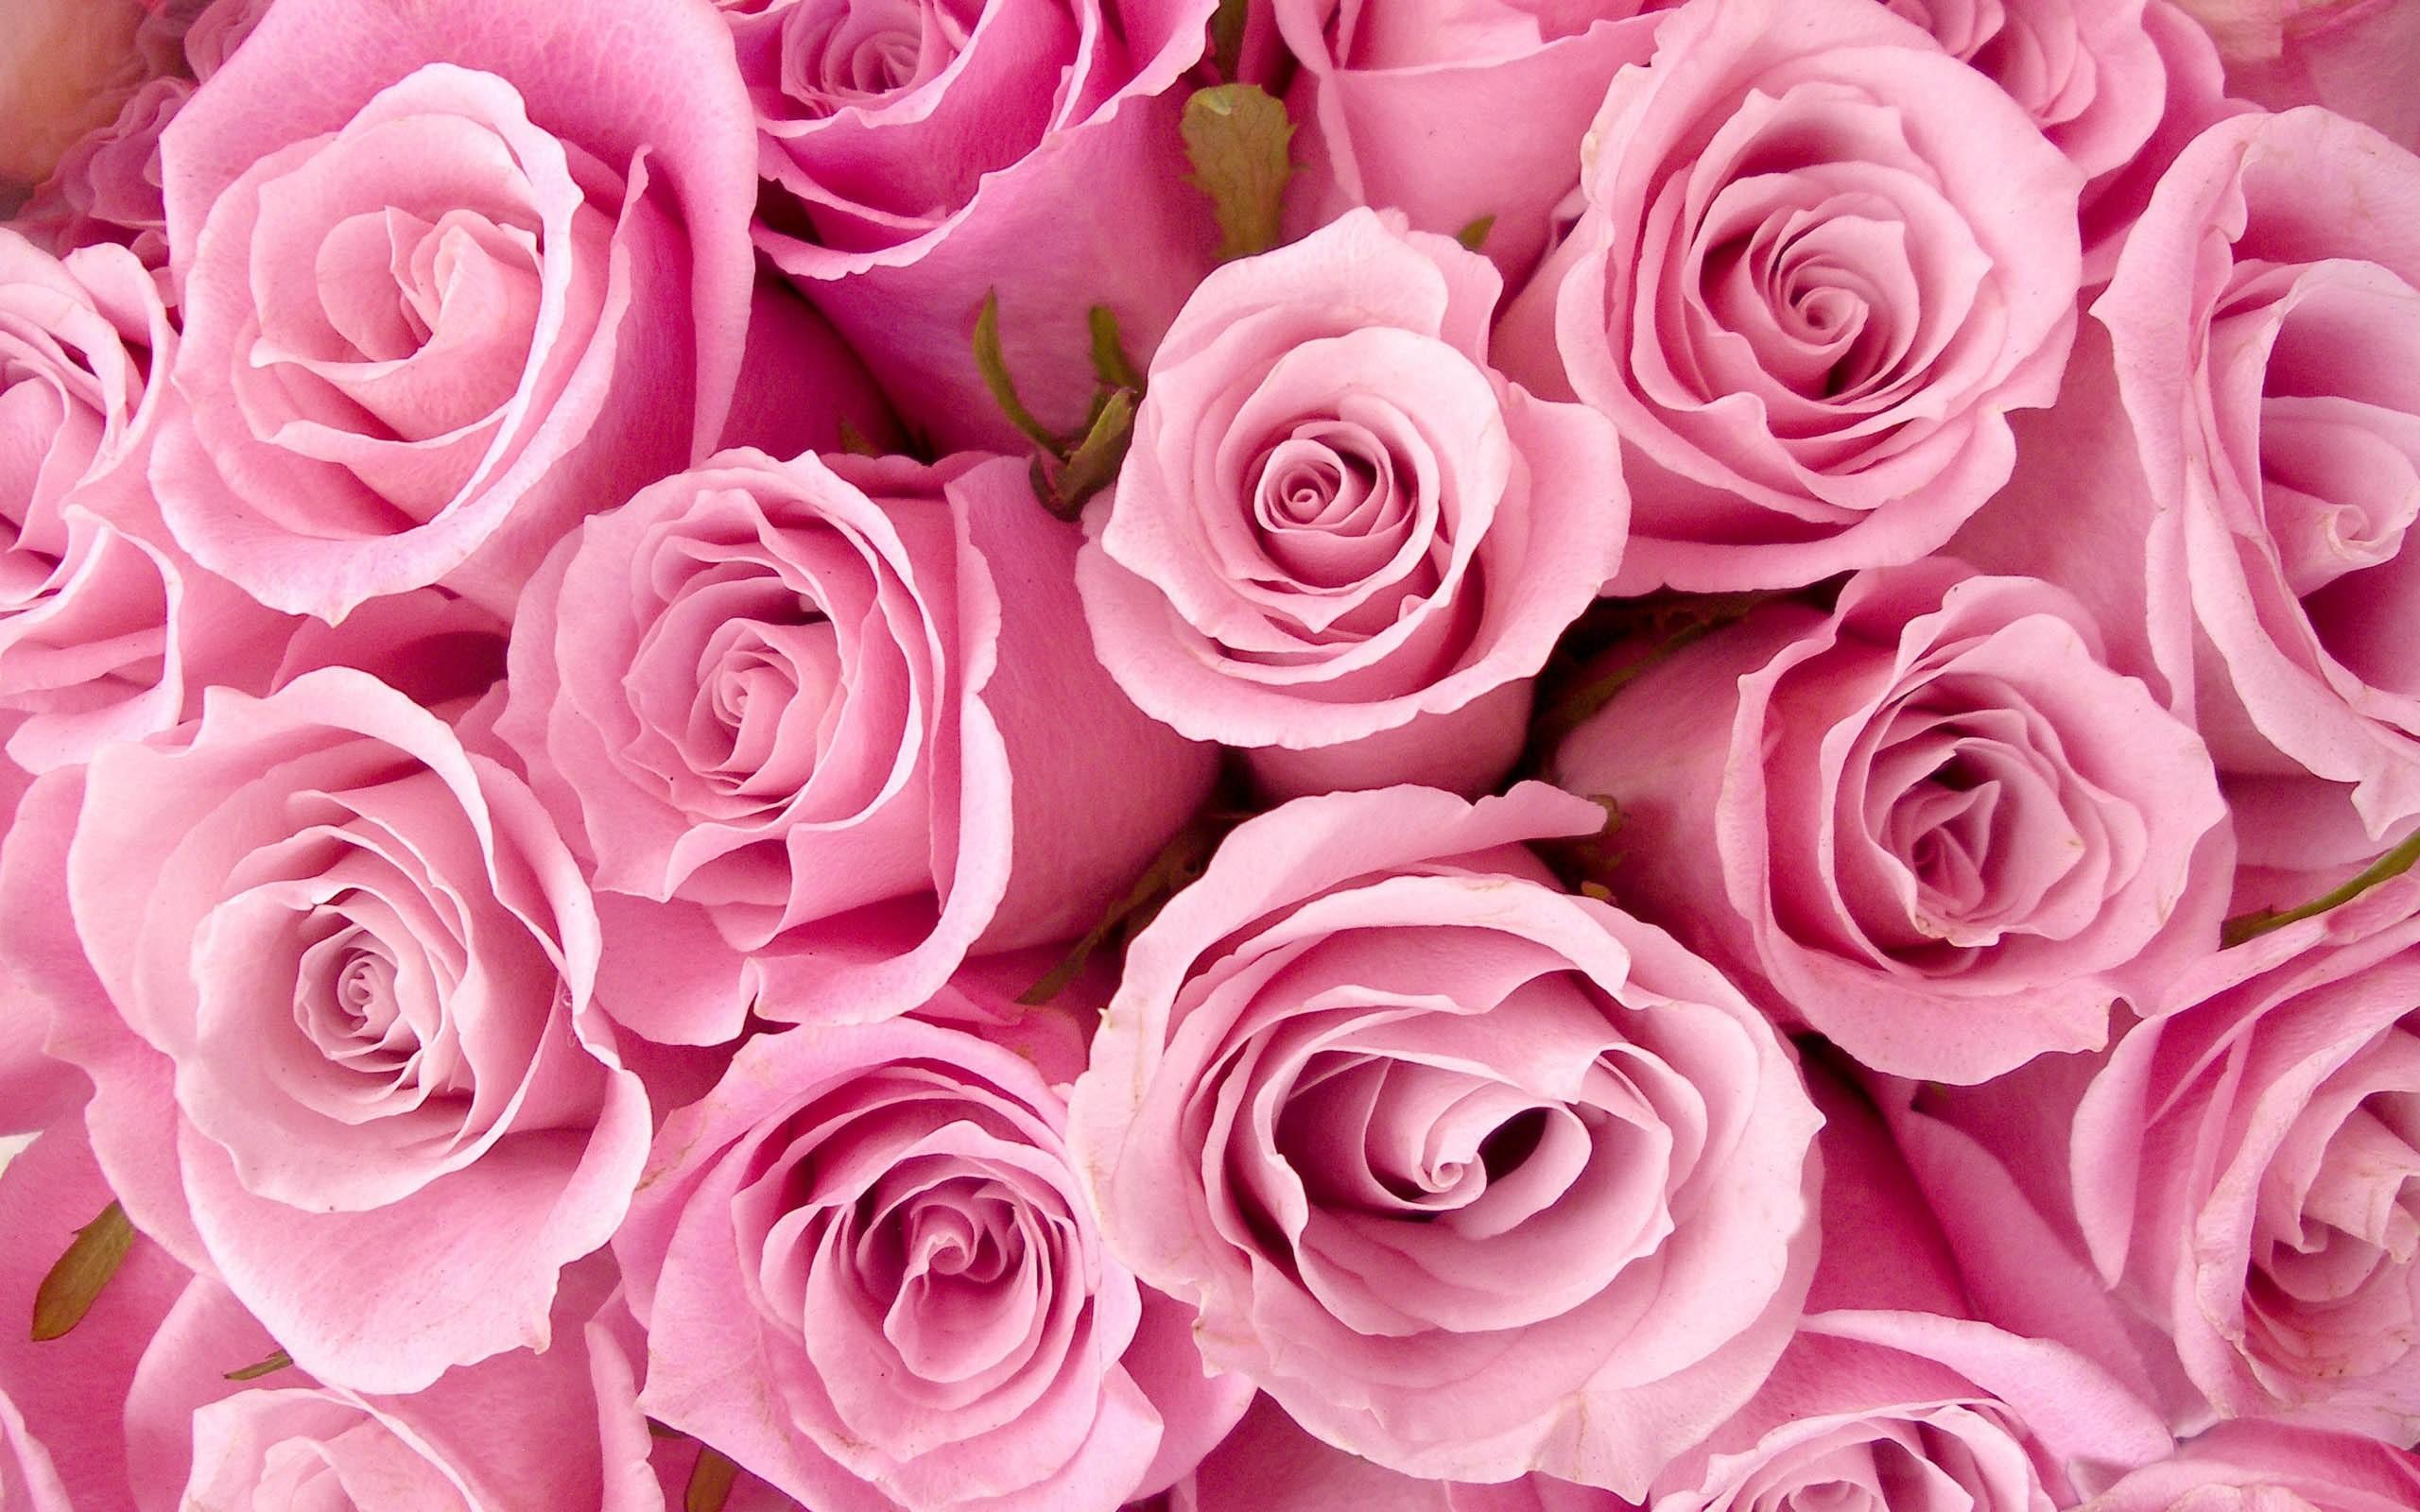 beautiful pink flower wallpaper tumblr hd · Girly Wallpapers For IphoneDesktop  …